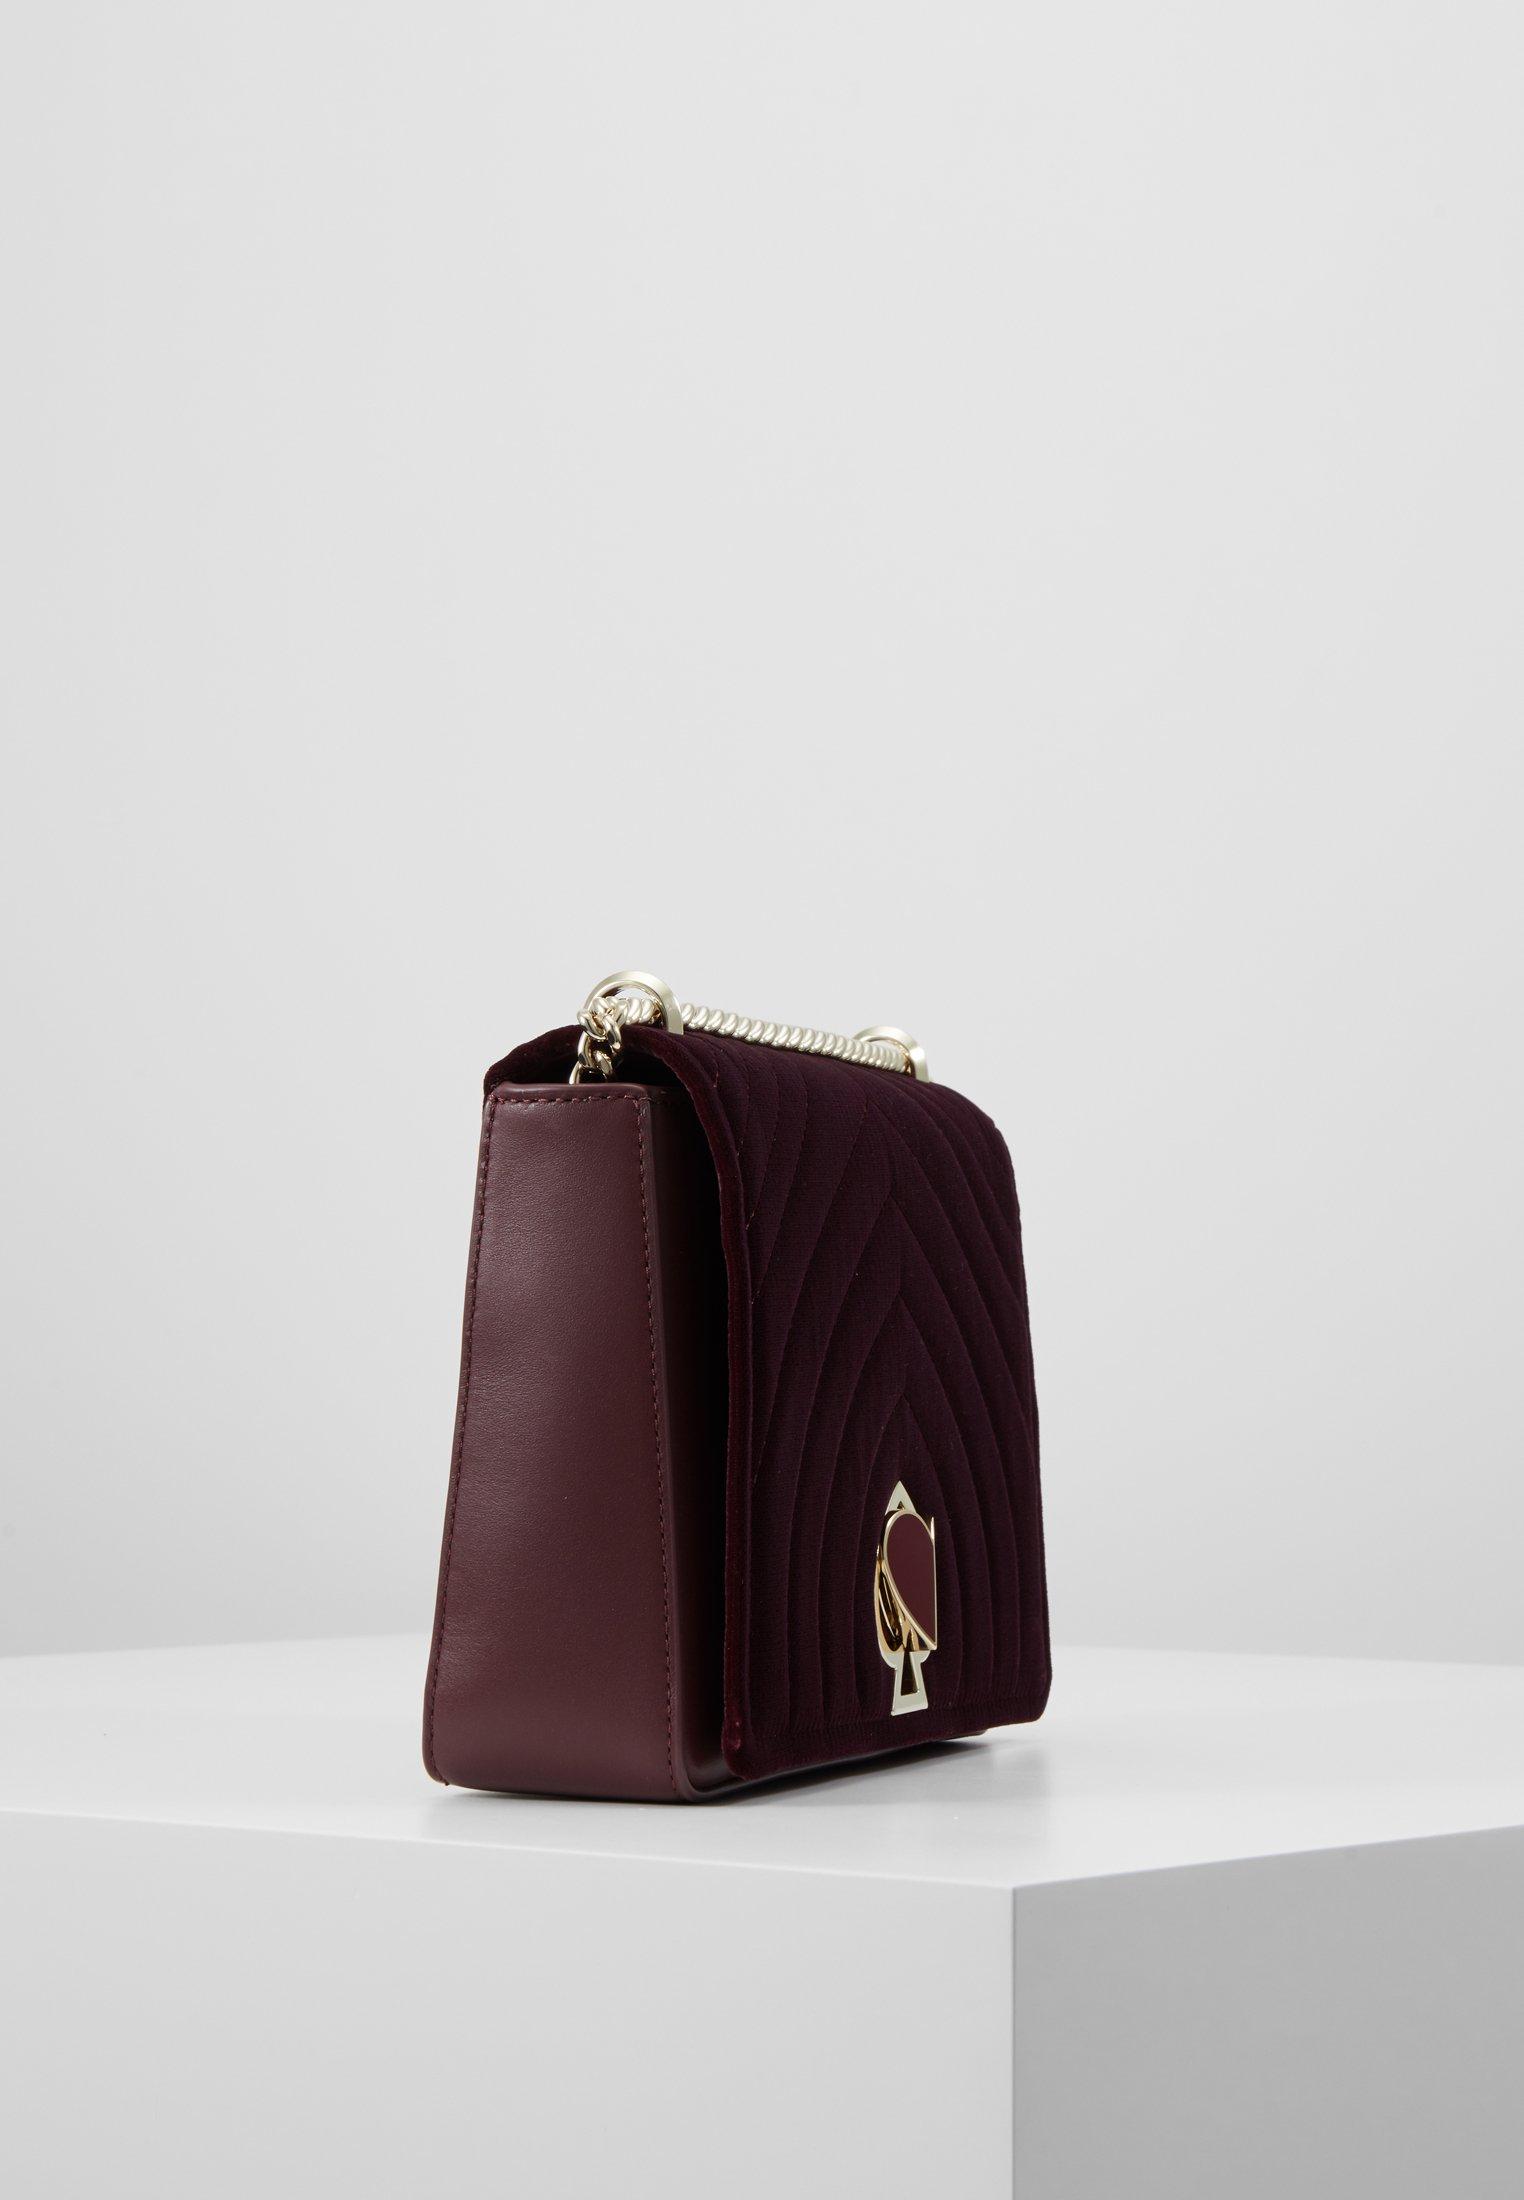 Kate Spade New York Medium Chain Shoulder Bag - Sac Bandoulière Cherrywood